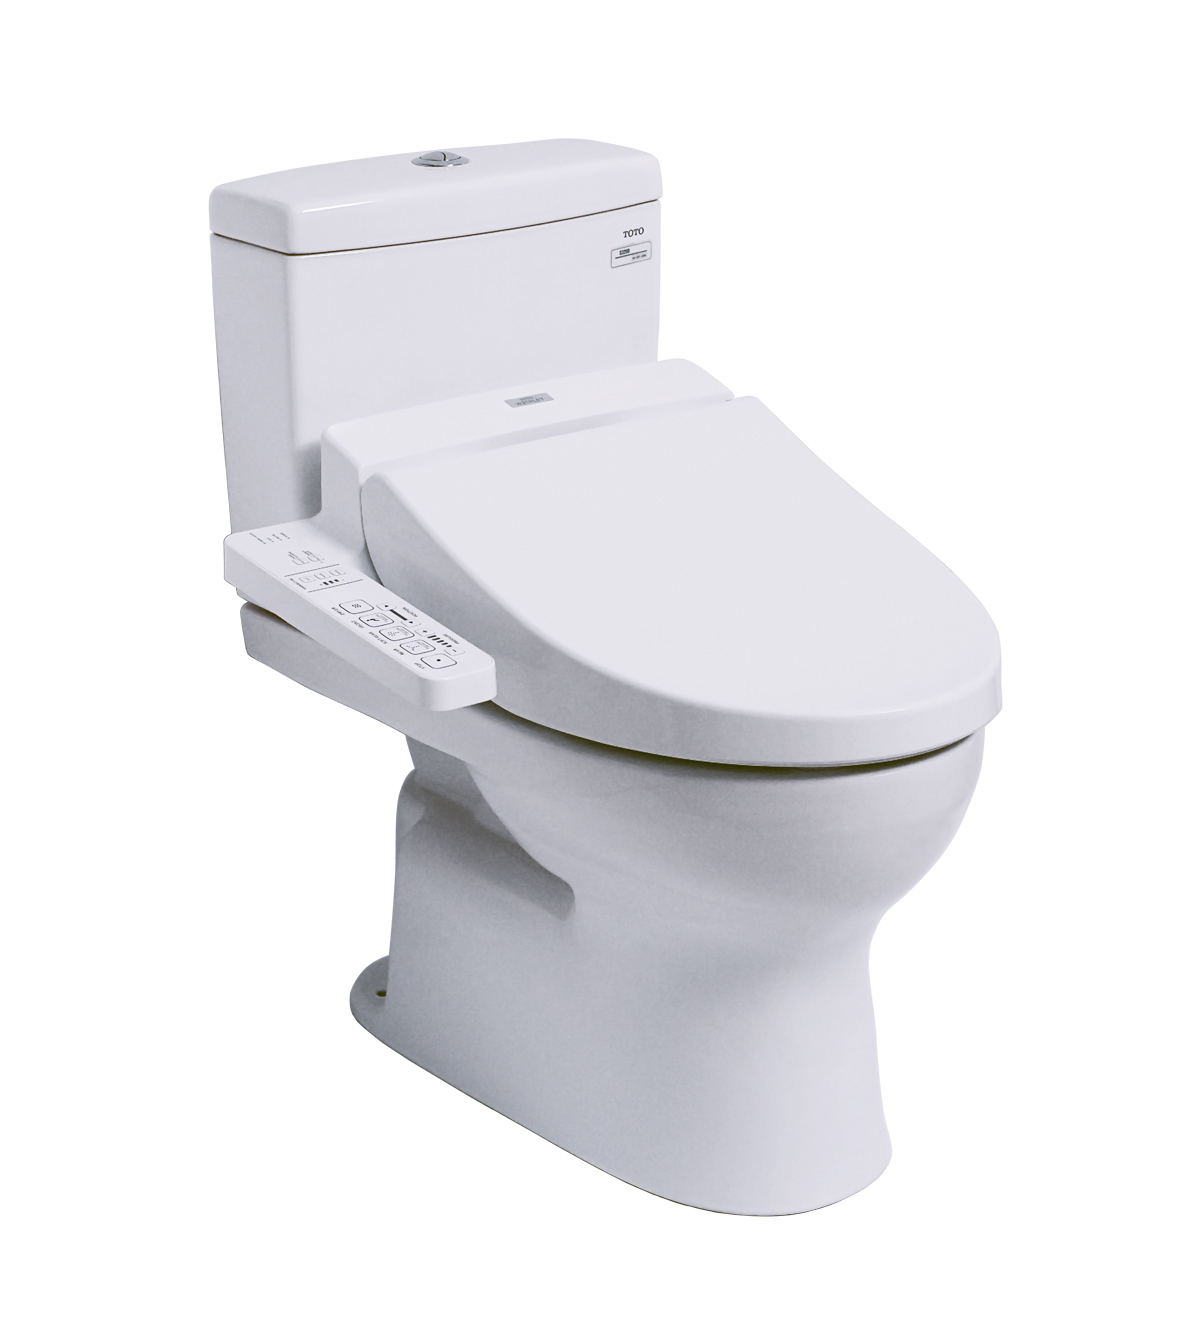 Bồn cầu toto Washlet CST351DW